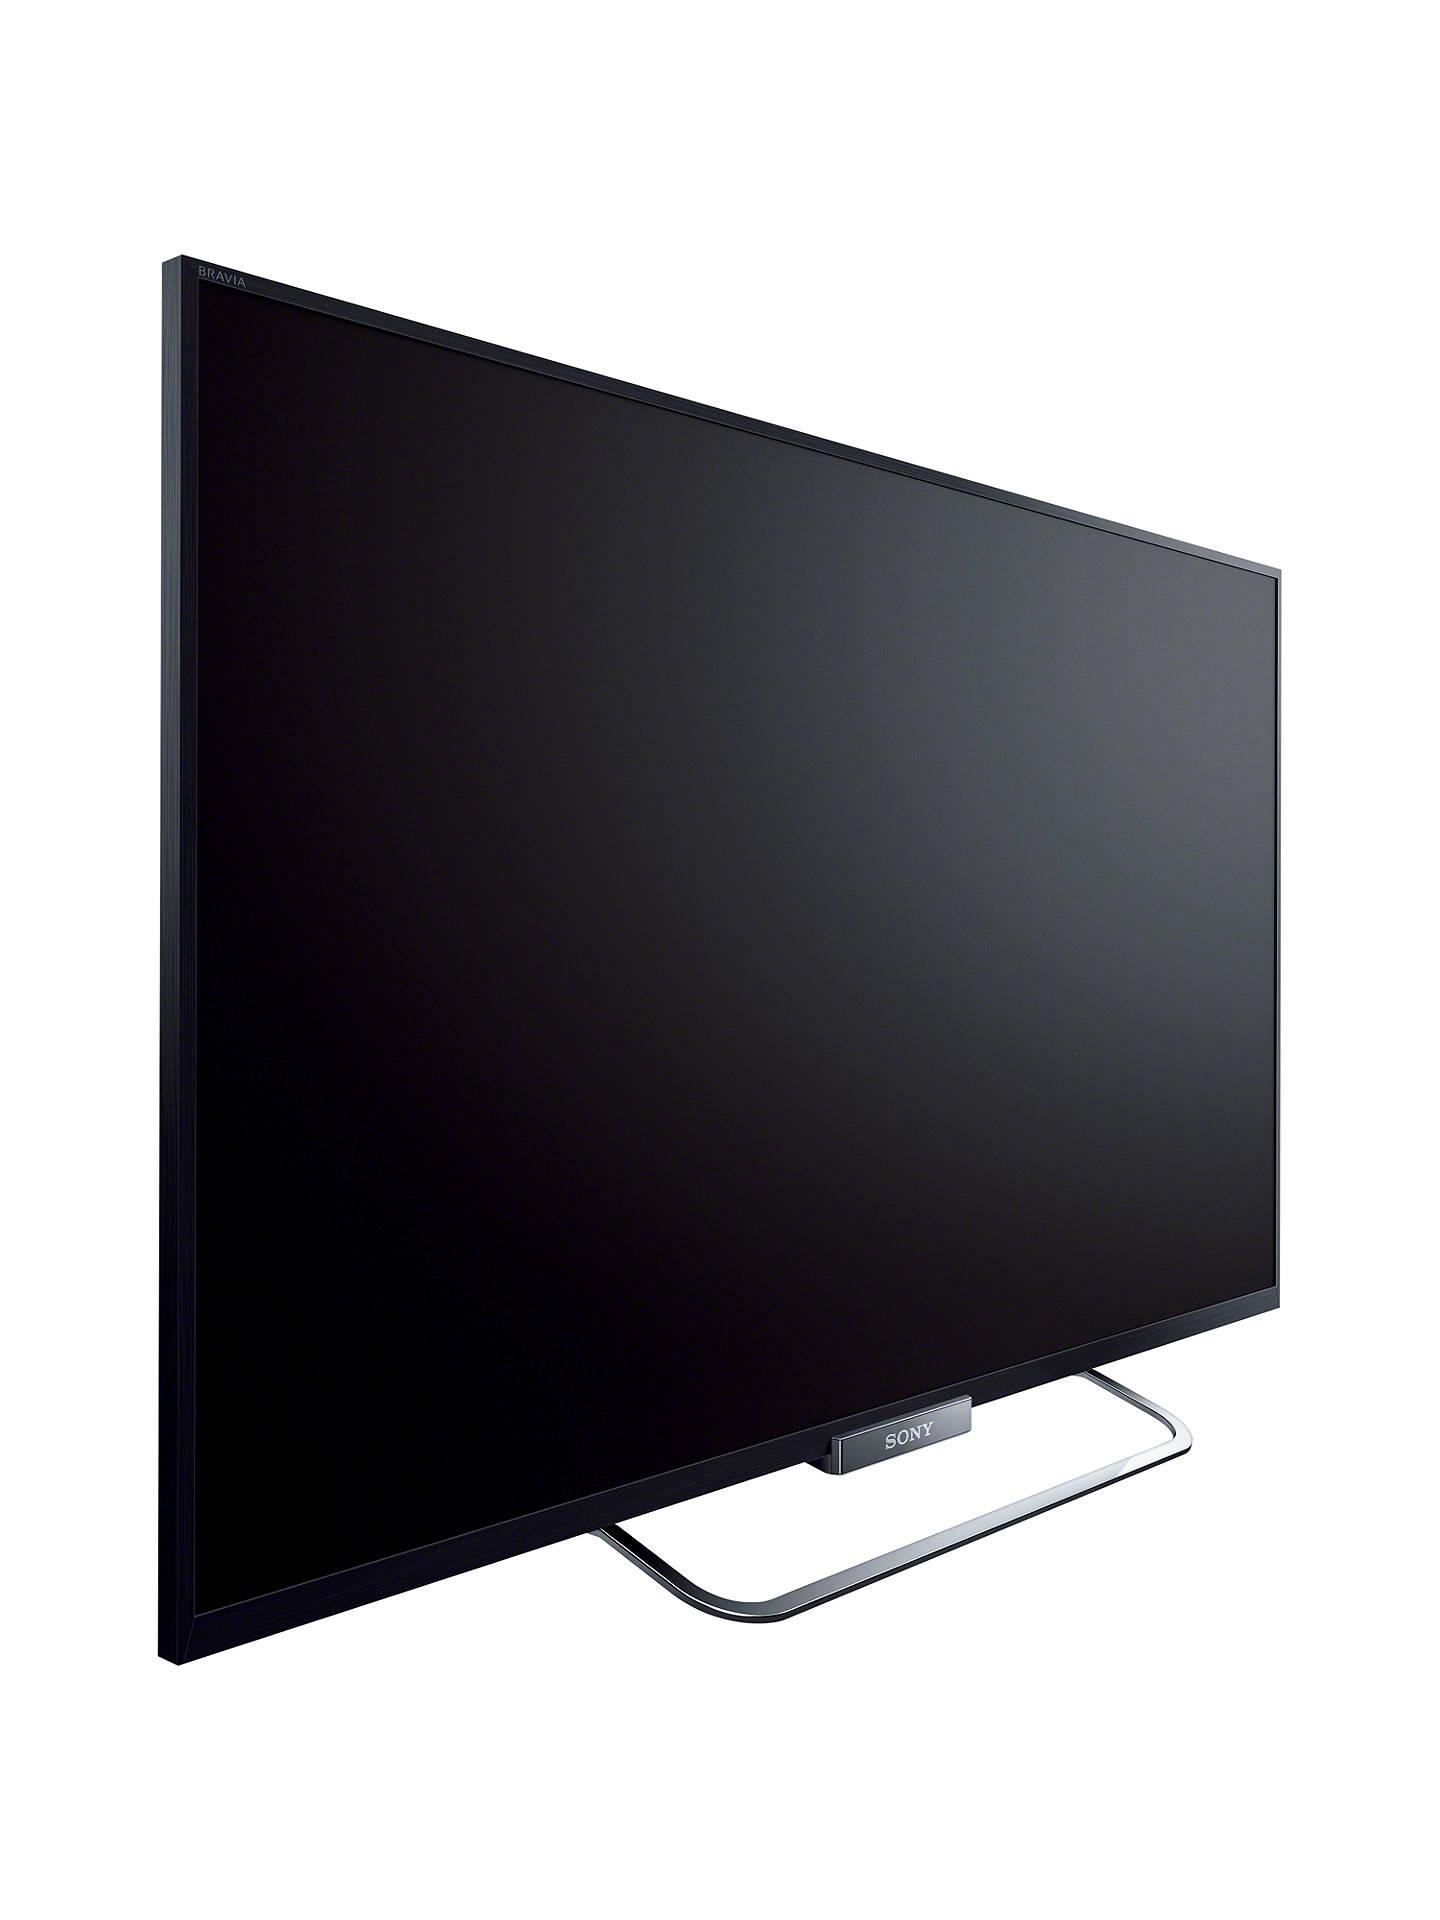 Sony Bravia KDL42W653 LED HD 1080p Smart TV, 42